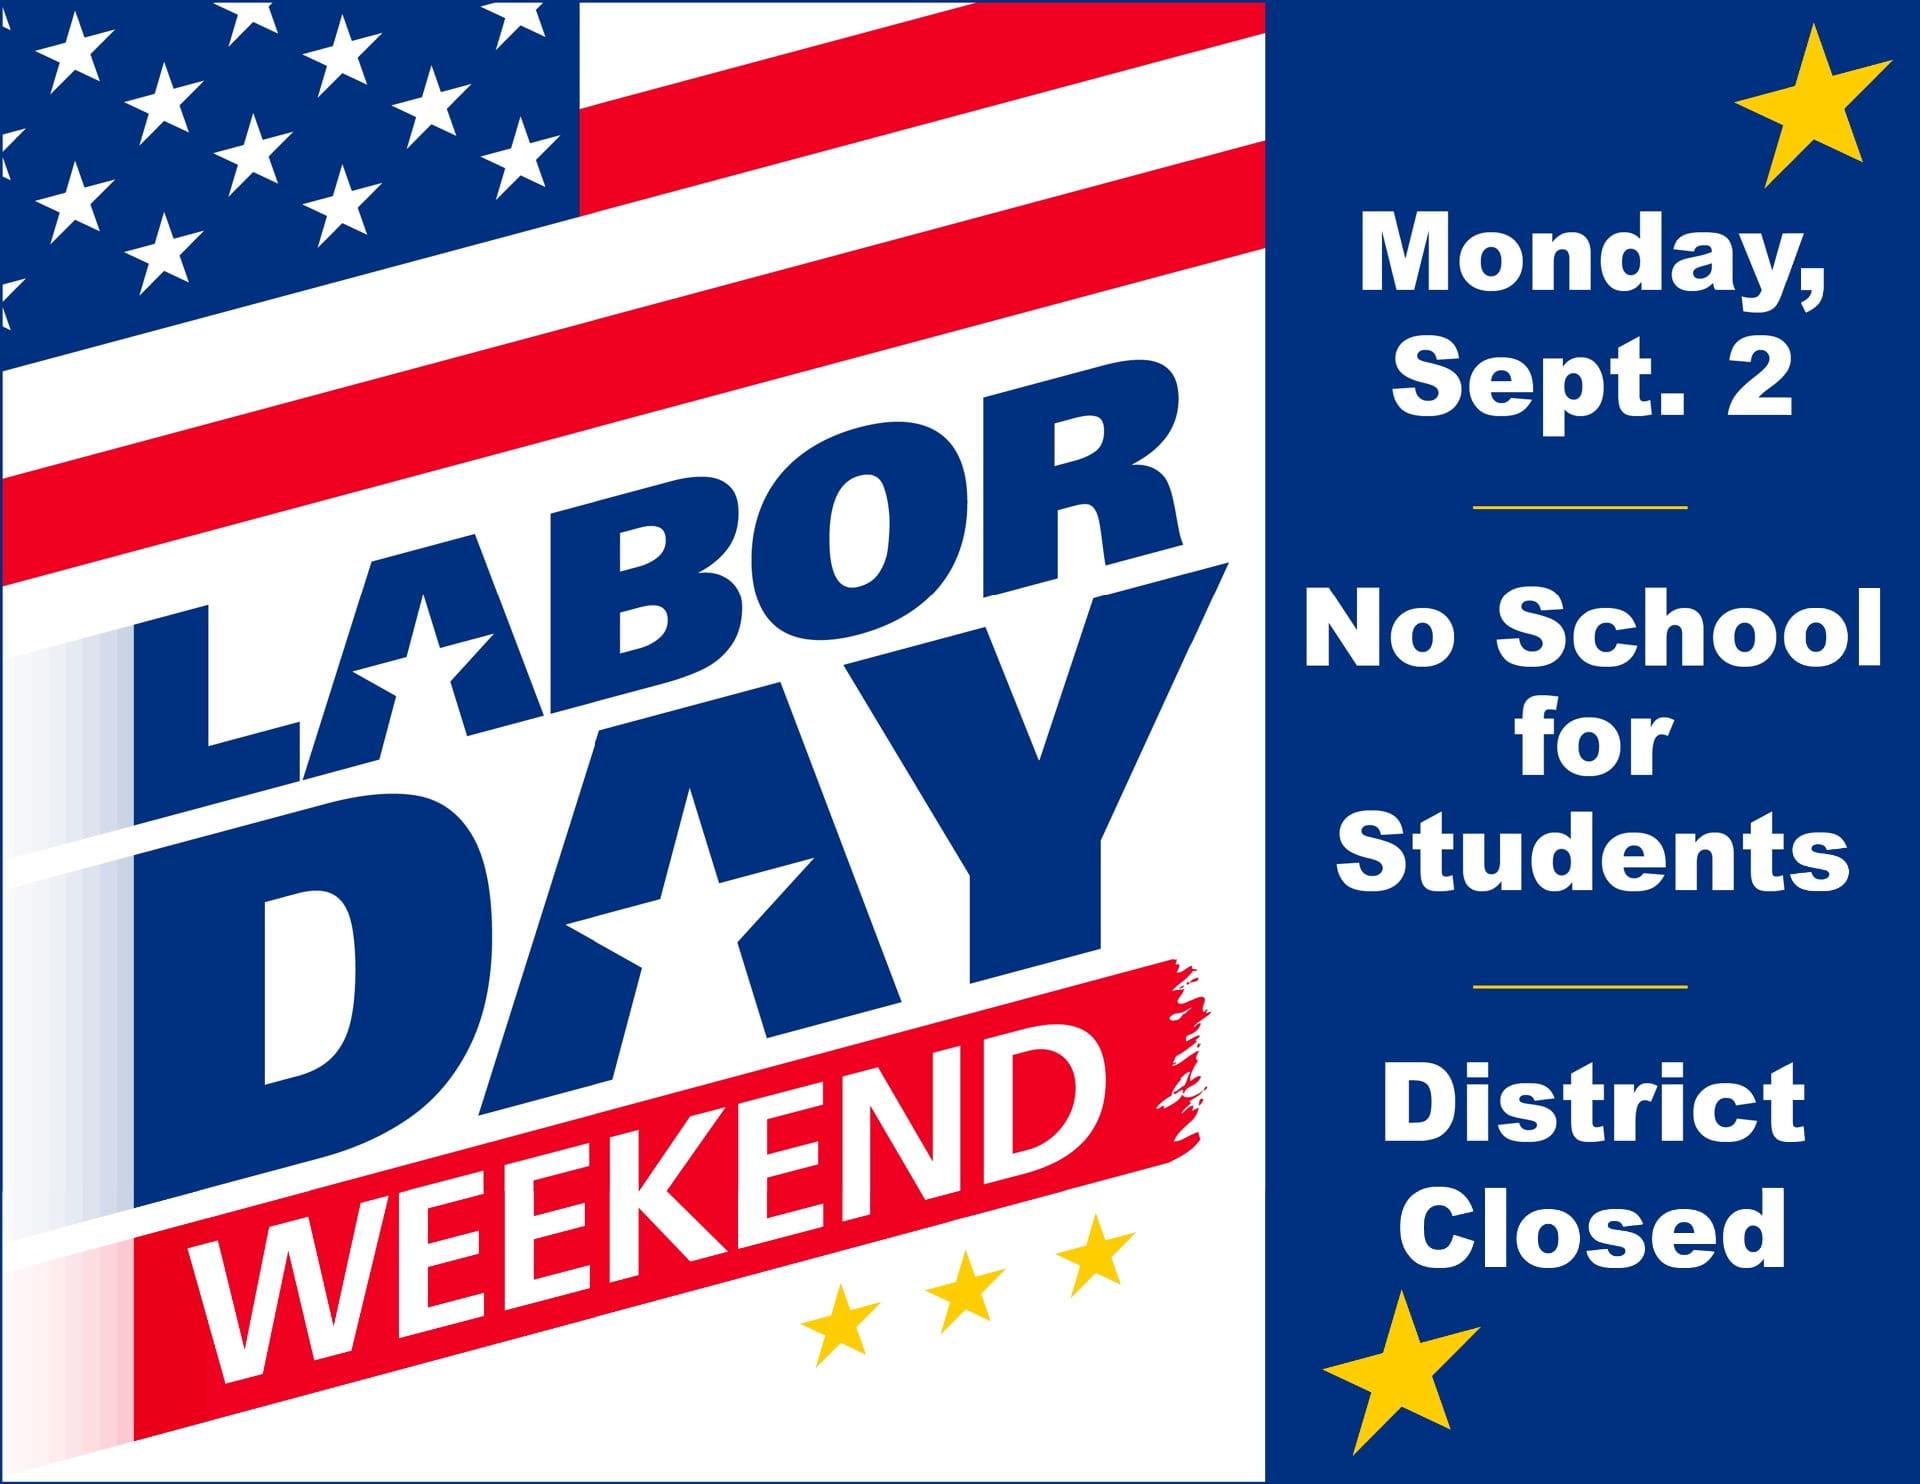 No School On Labor Day